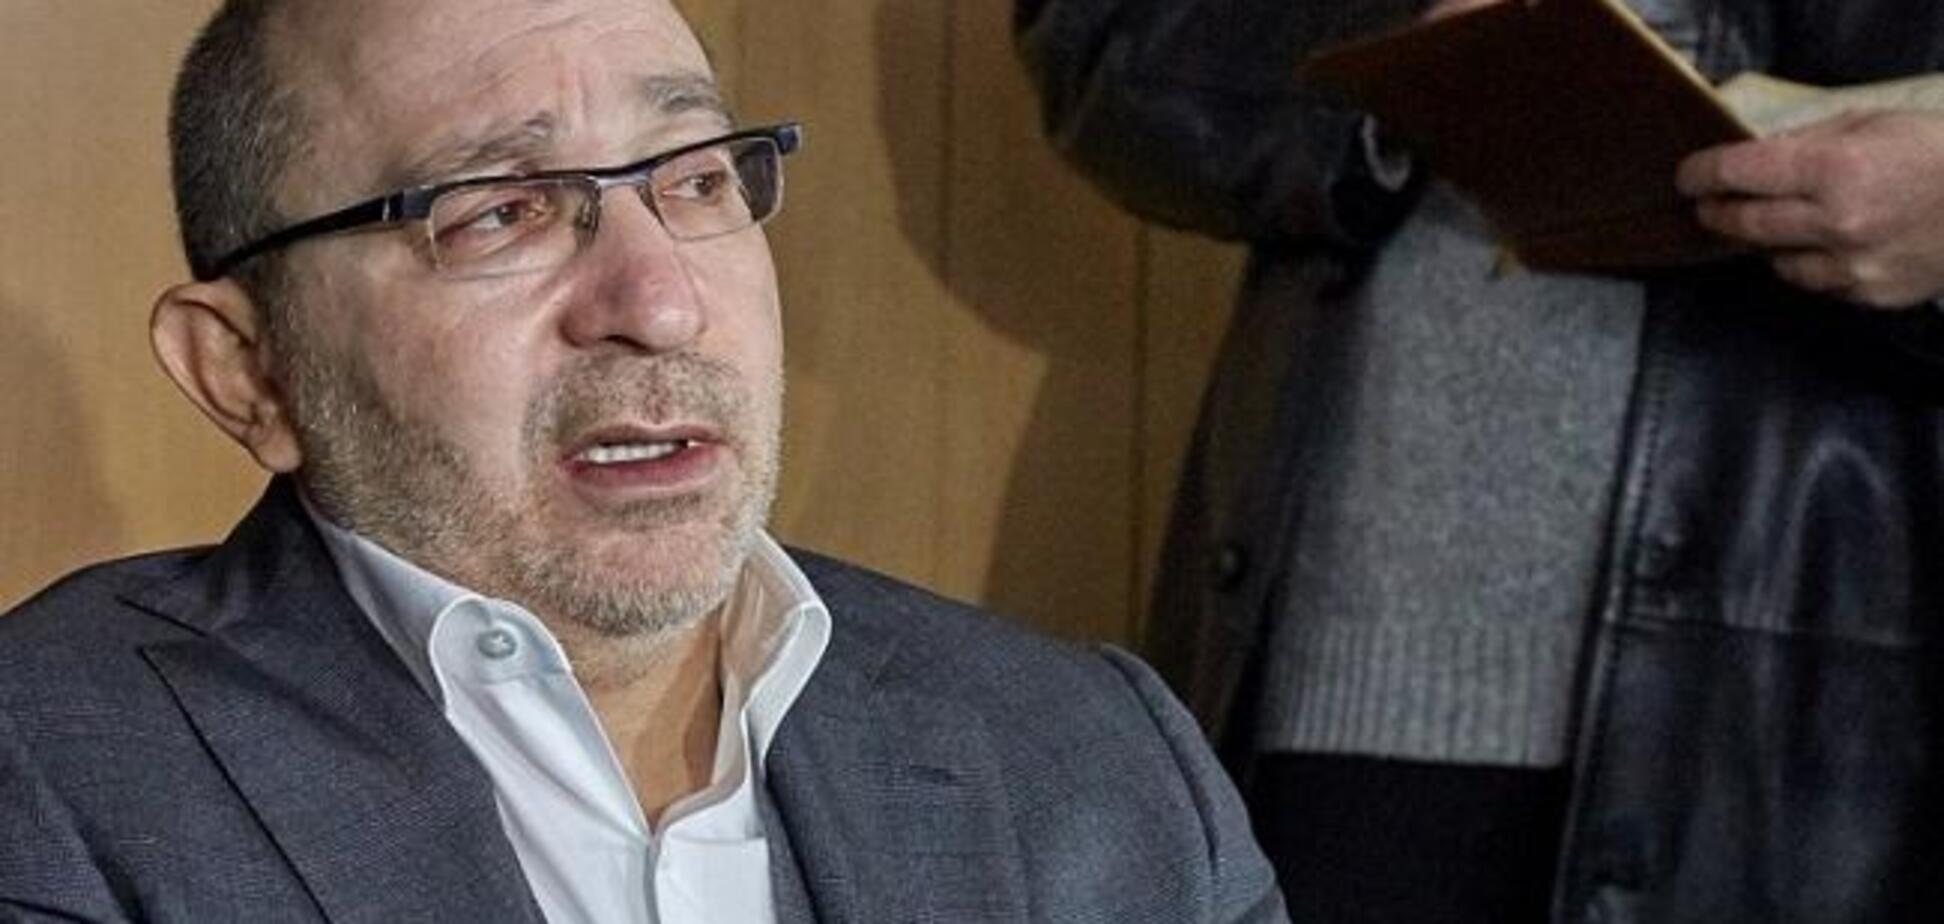 Справа Кернеса: ГПУ оскаржила рішення суду